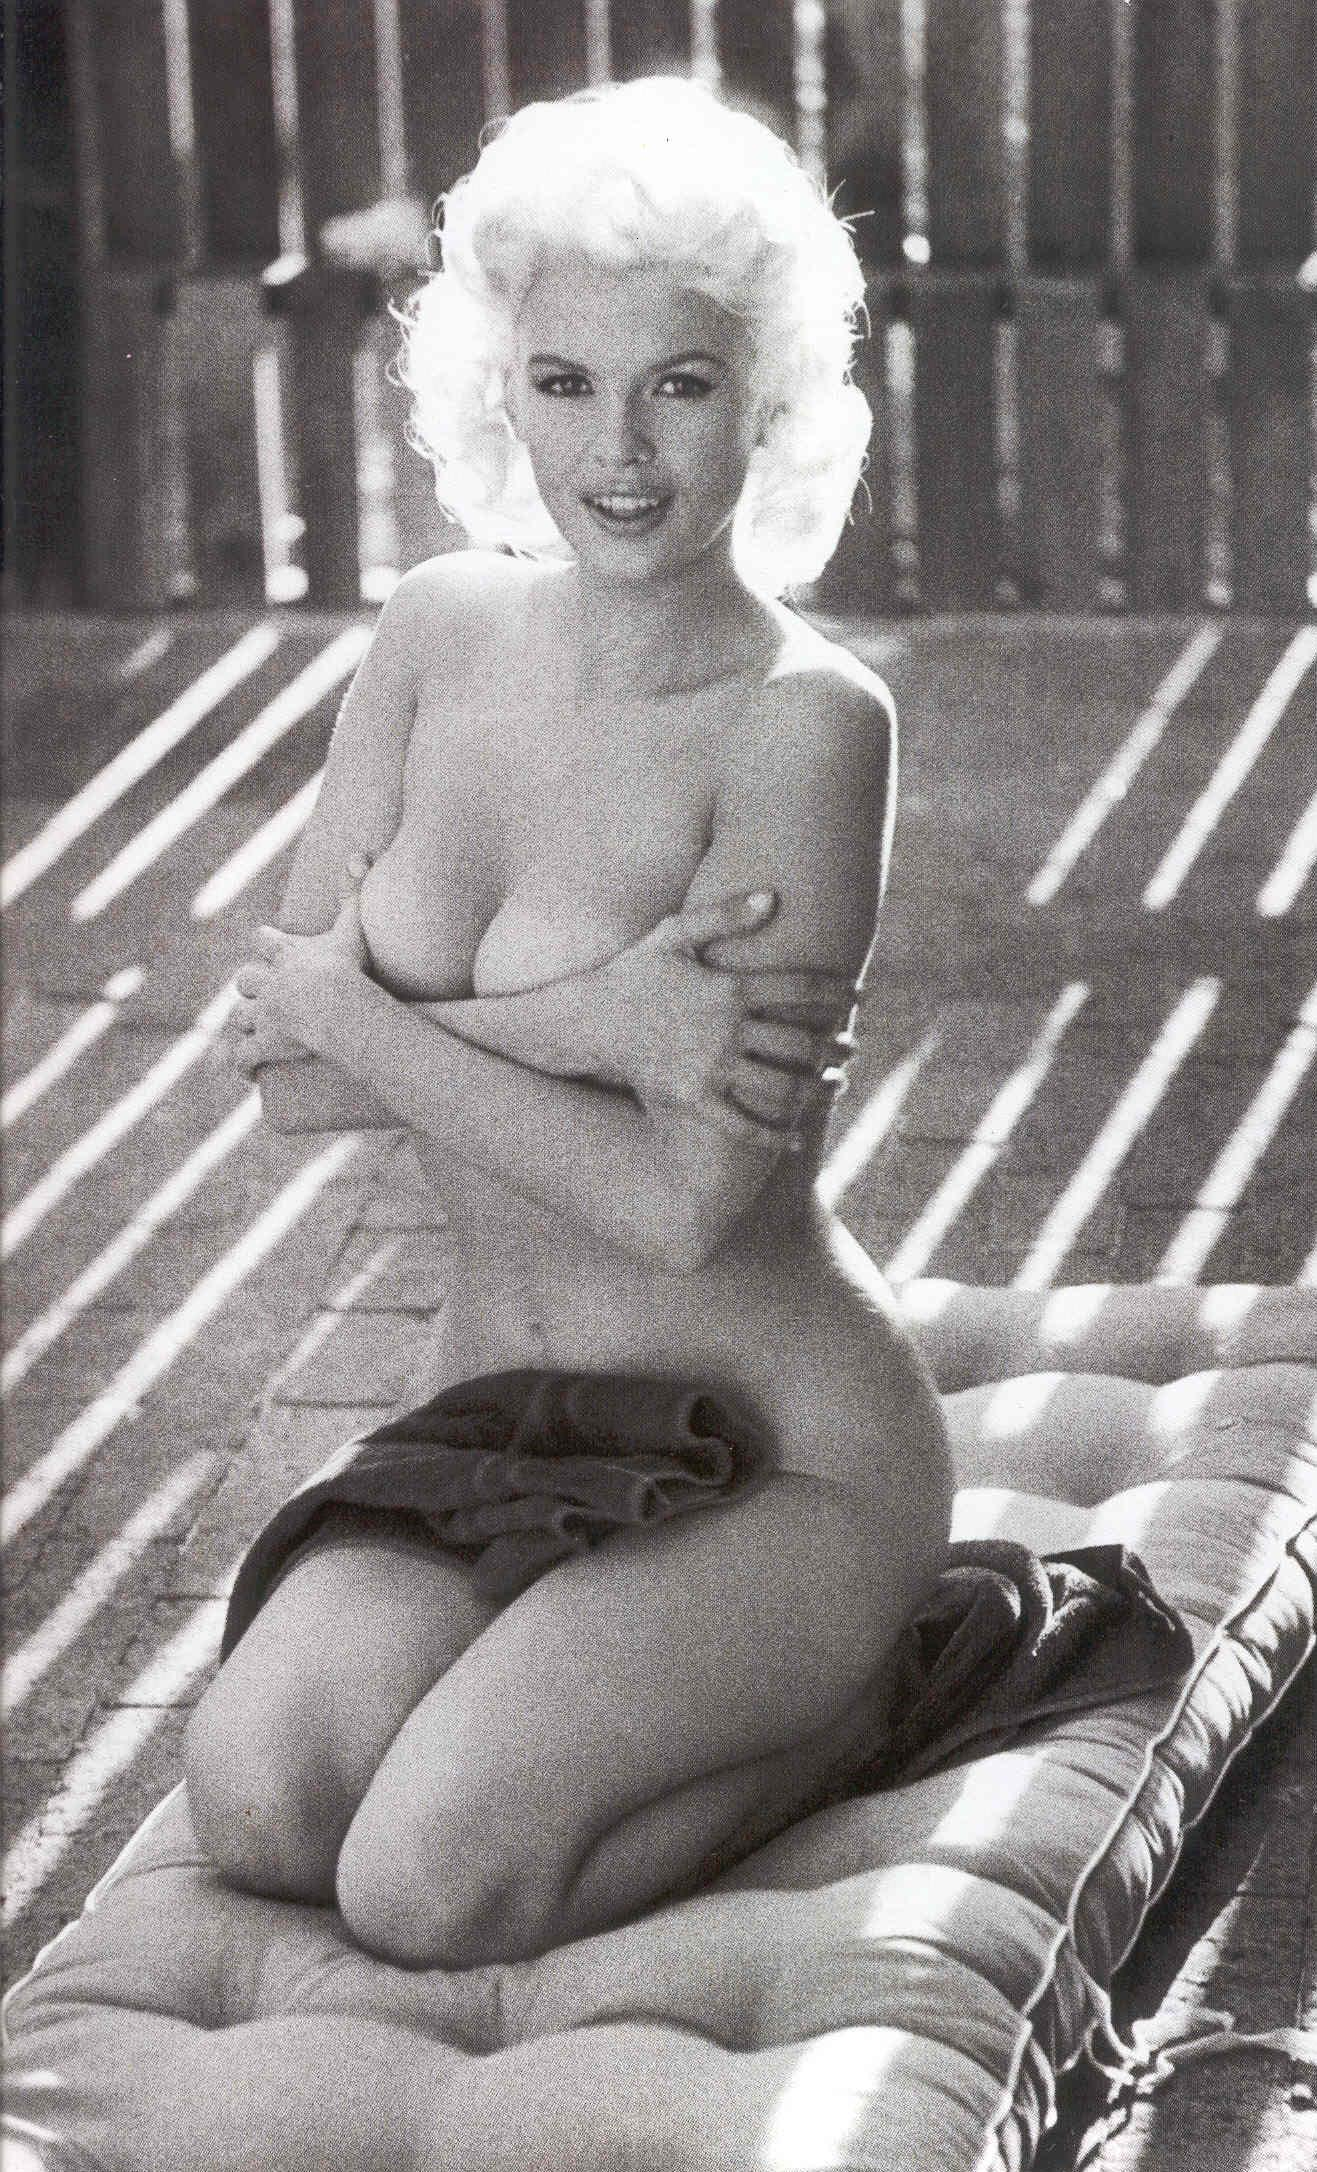 jayne mansfield nude photo gallery